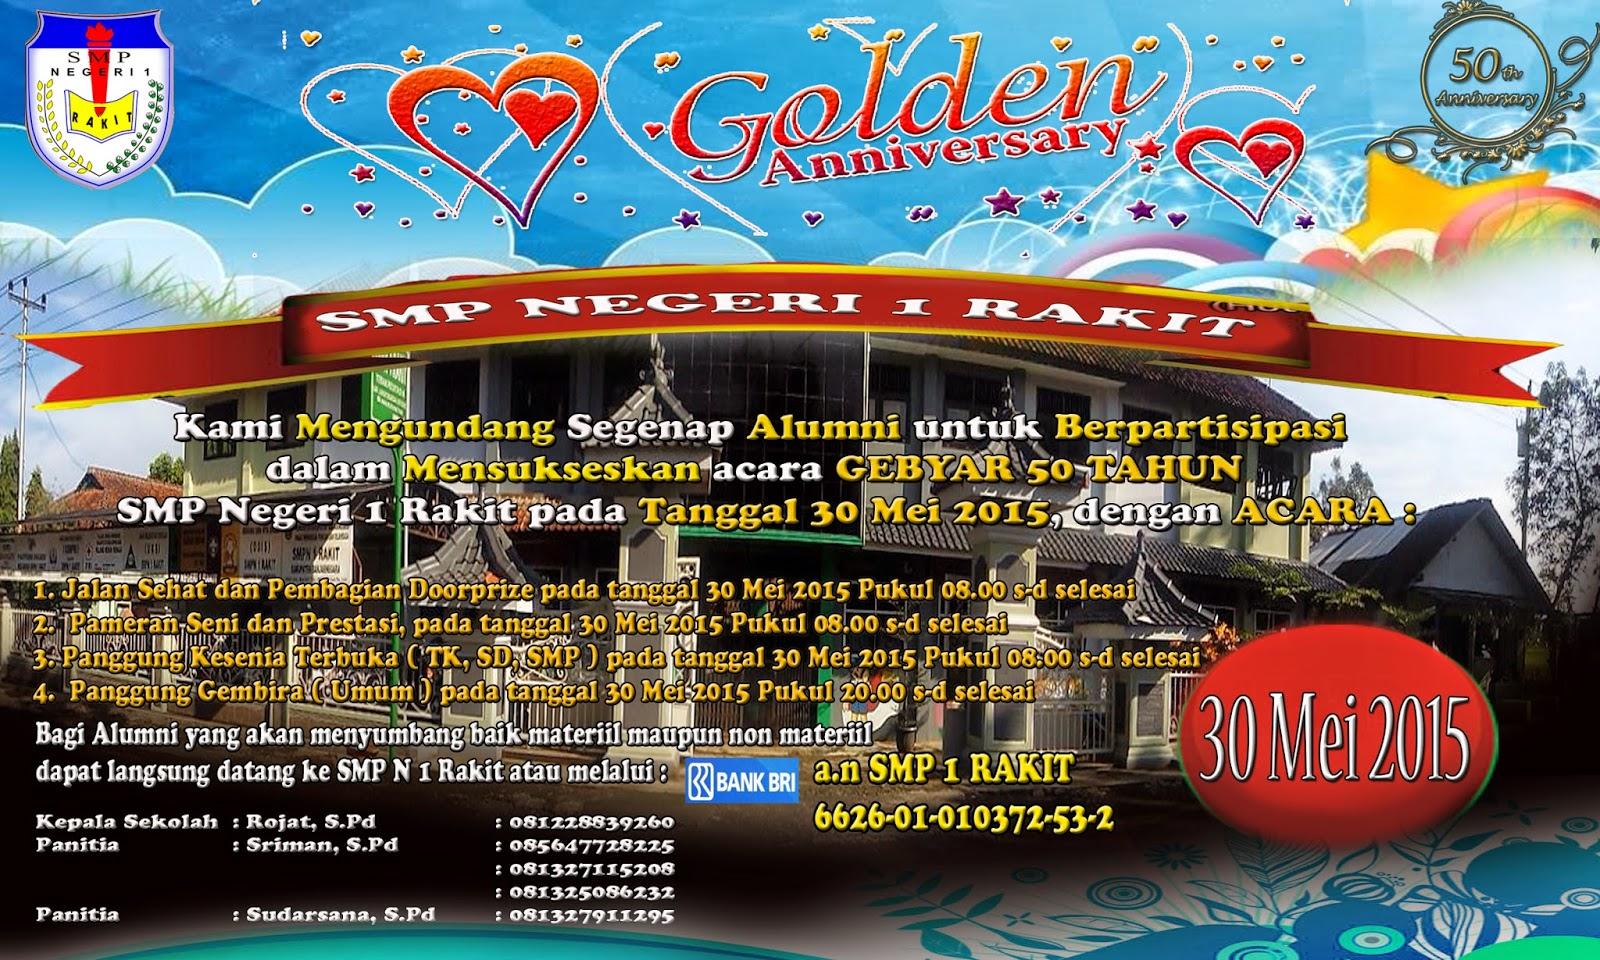 golden-anniversary-smp1rakit